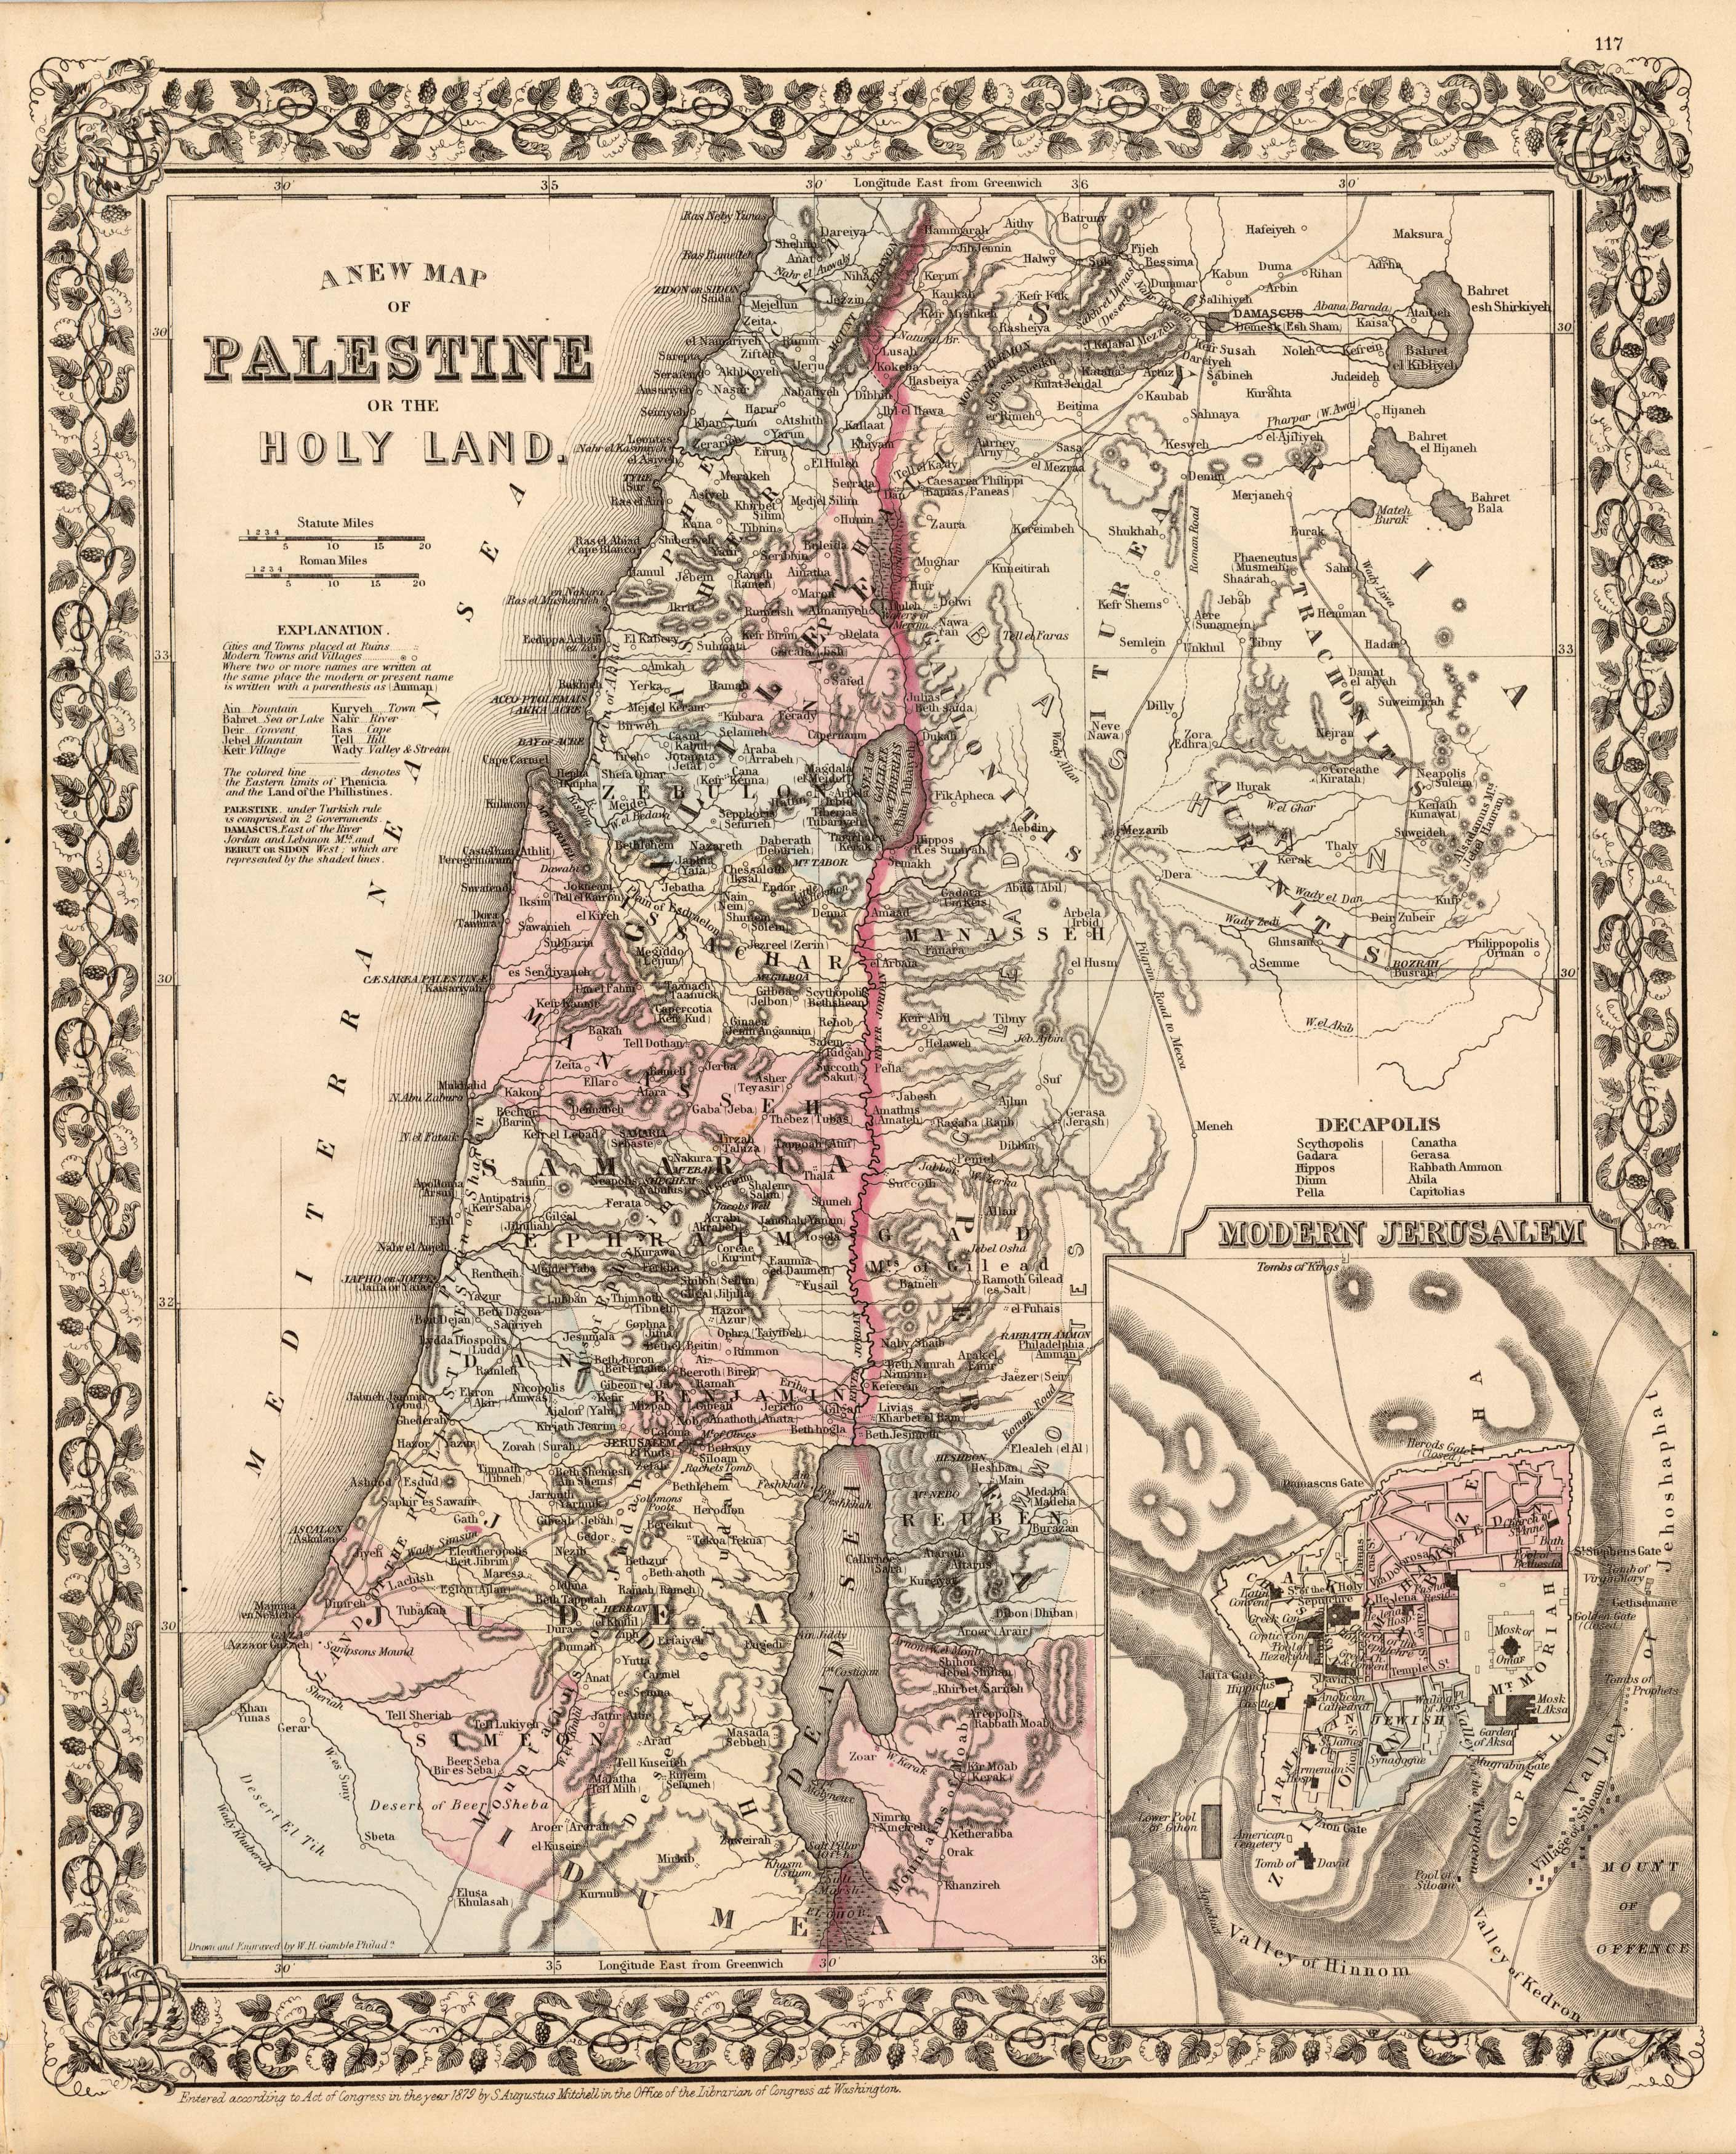 A New Map of Palestine or the Holy Land; Modern Jerusalem